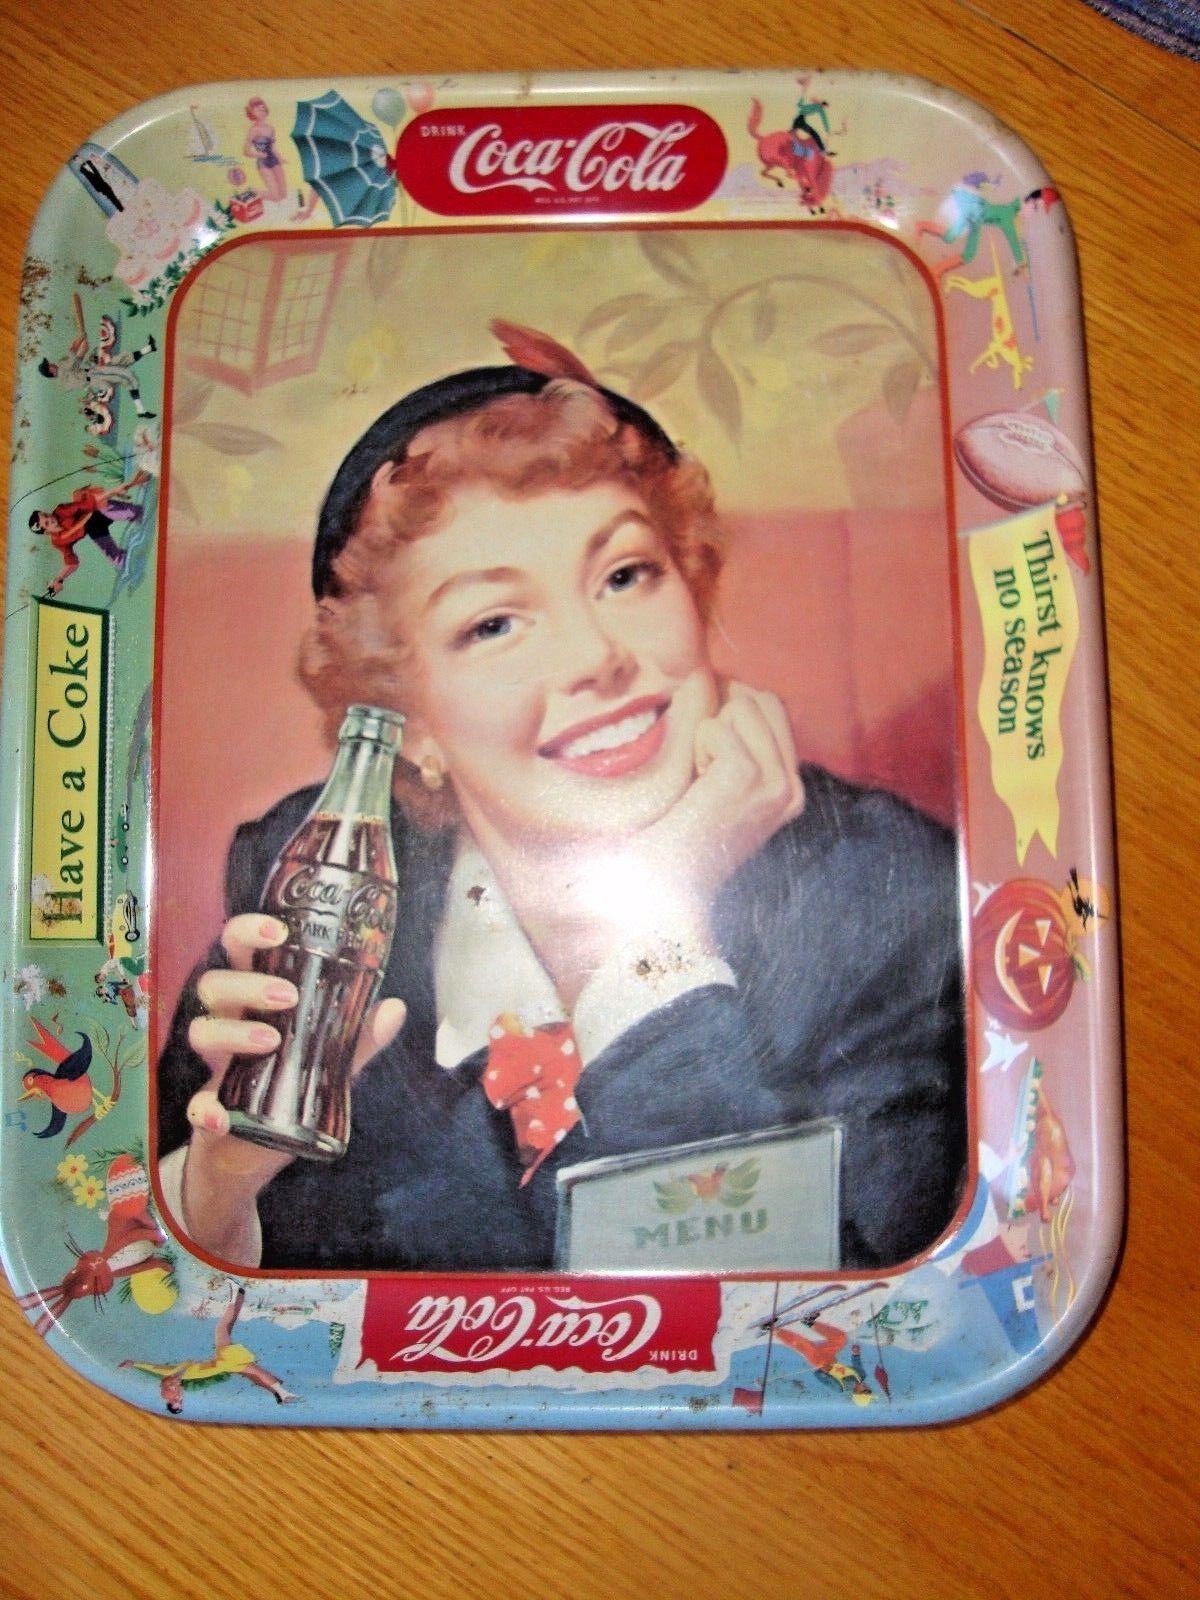 Original 1953 Vtg Coke Coca Cola Tray and 50 similar items